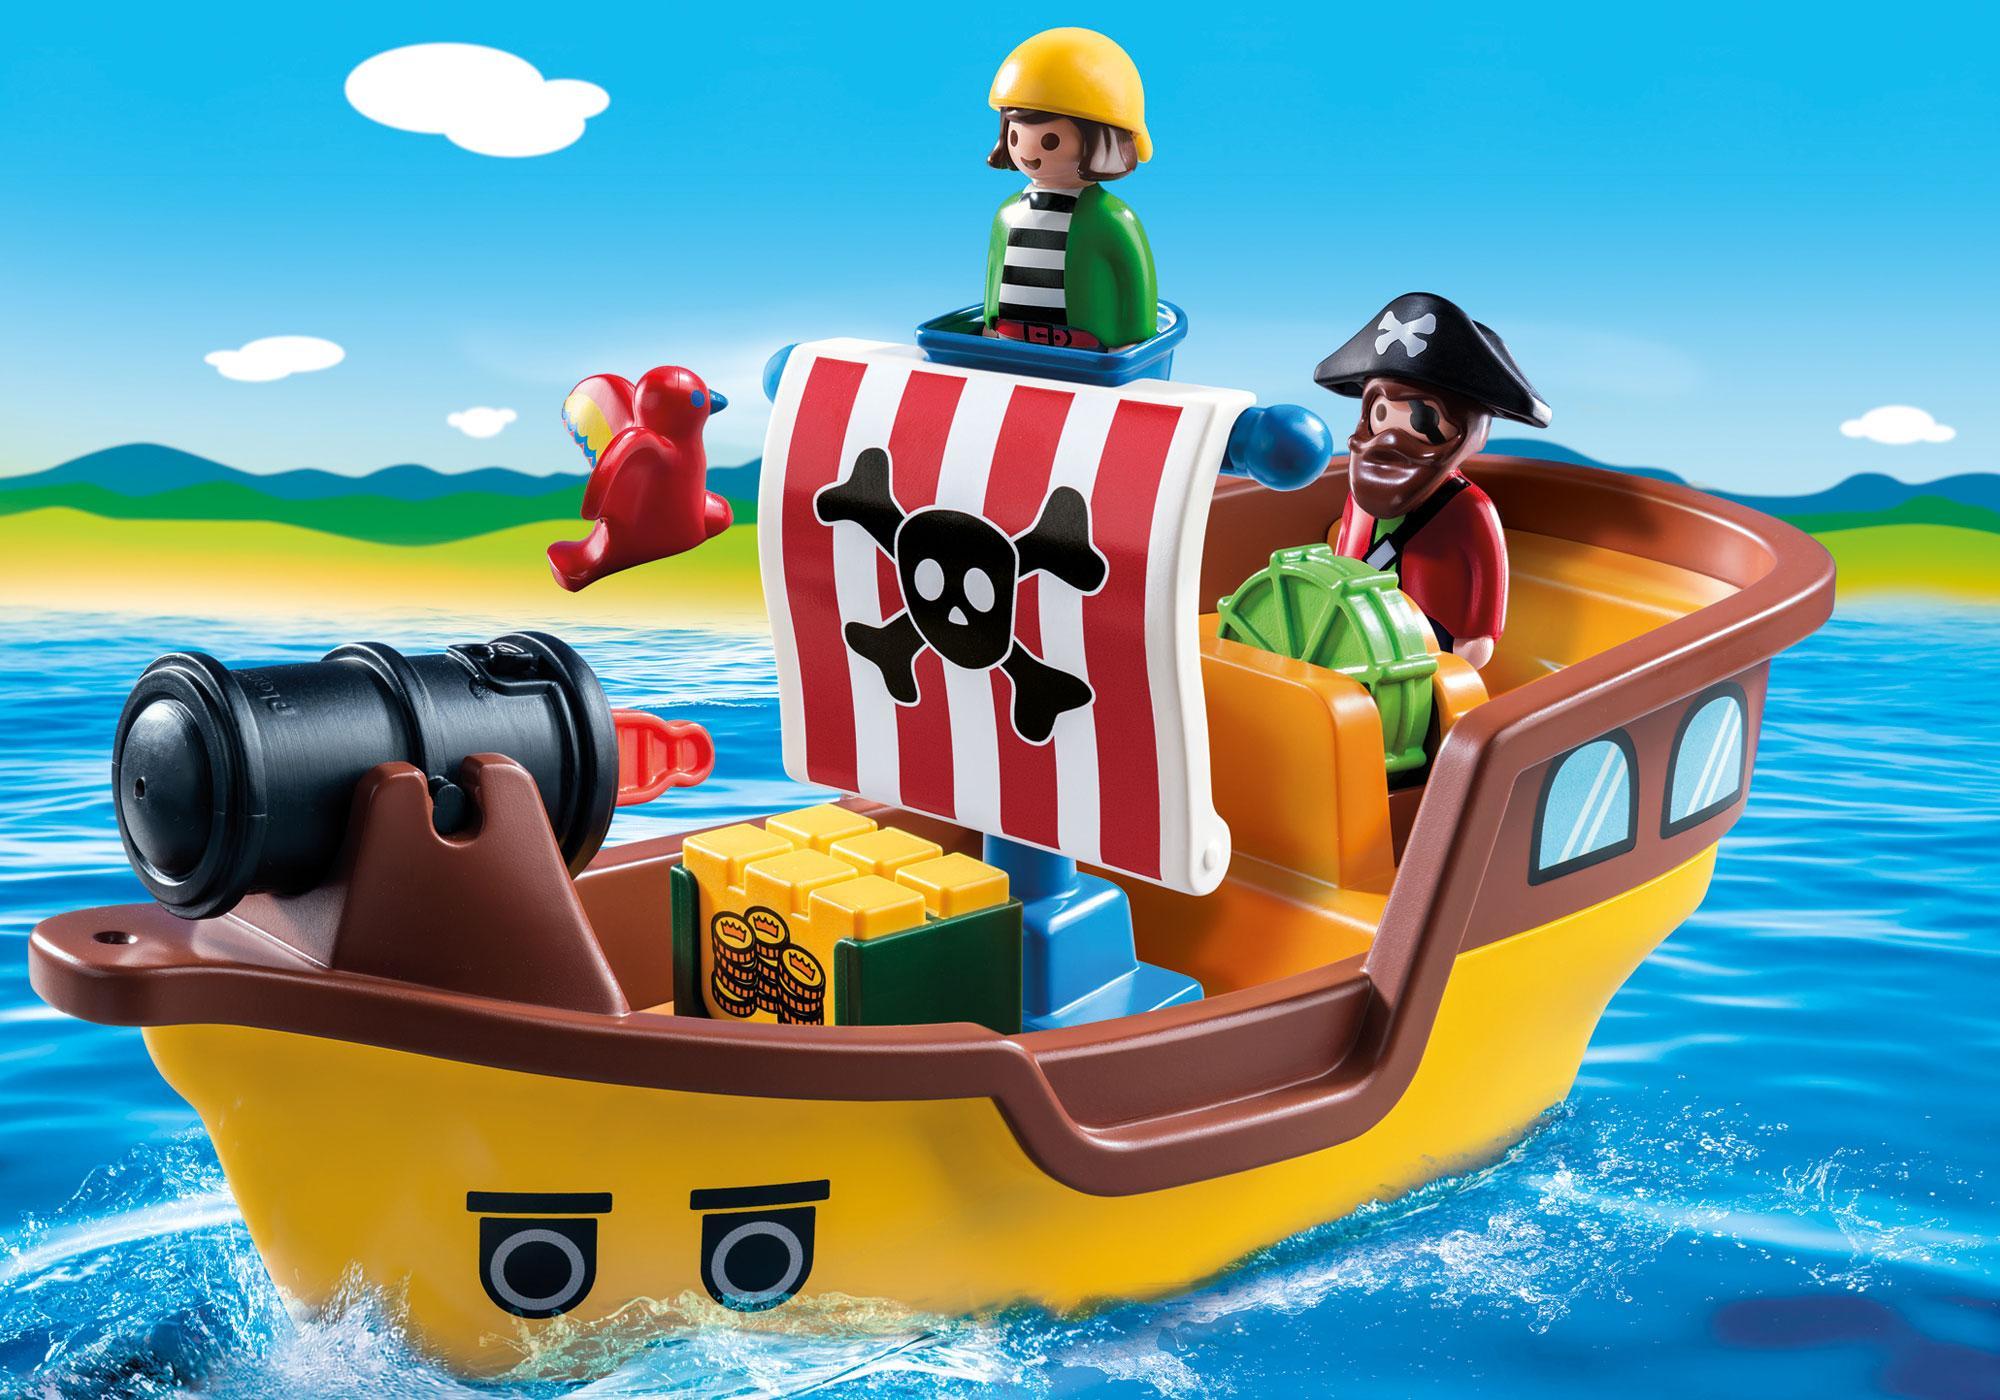 http://media.playmobil.com/i/playmobil/9118_product_detail/1.2.3 Piratenschip